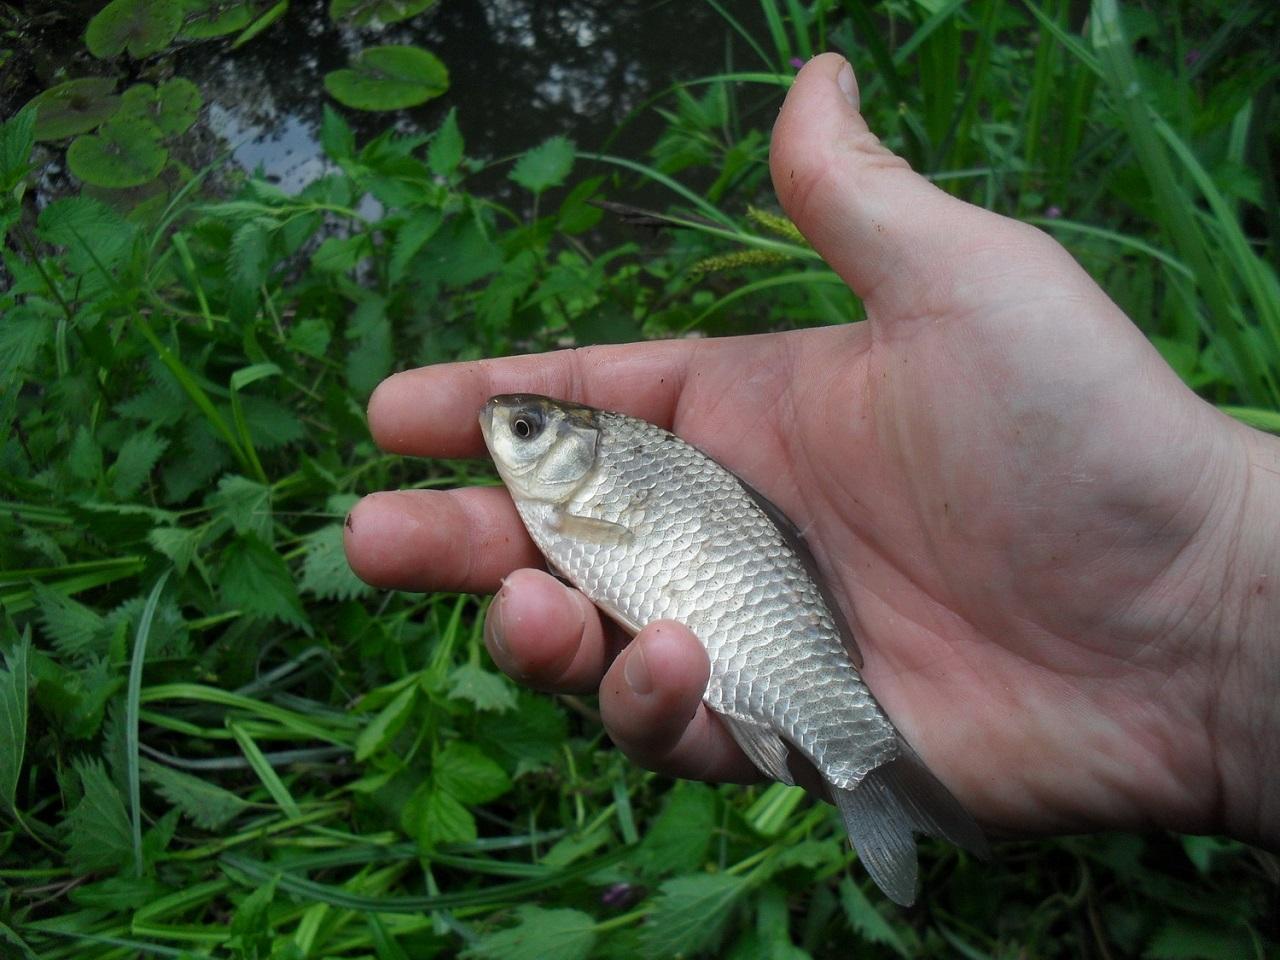 babuska i ribolov babuske